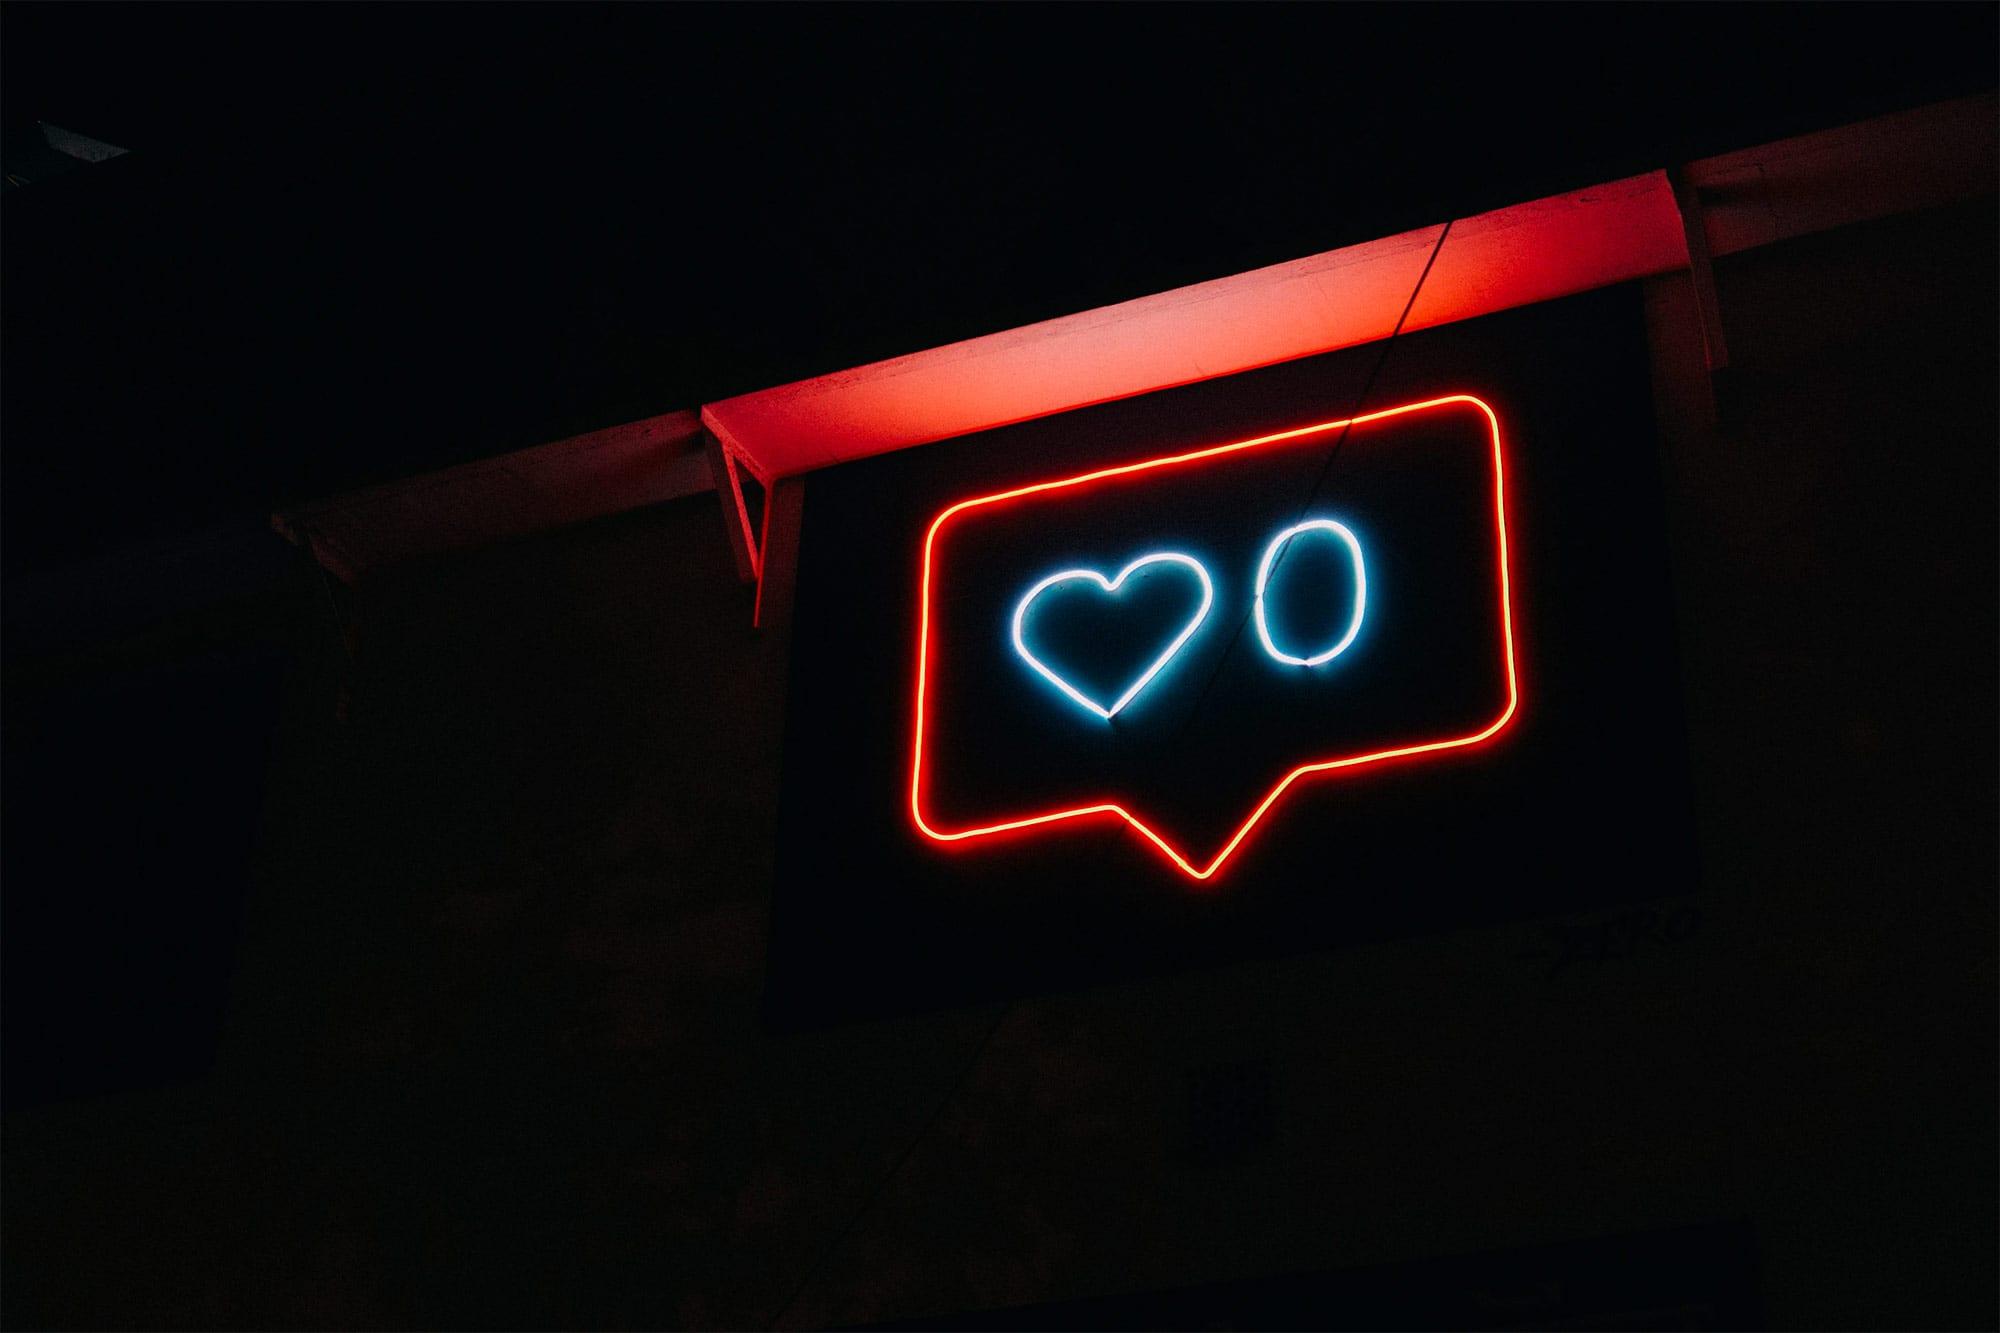 milesband real estate branding marketing social media